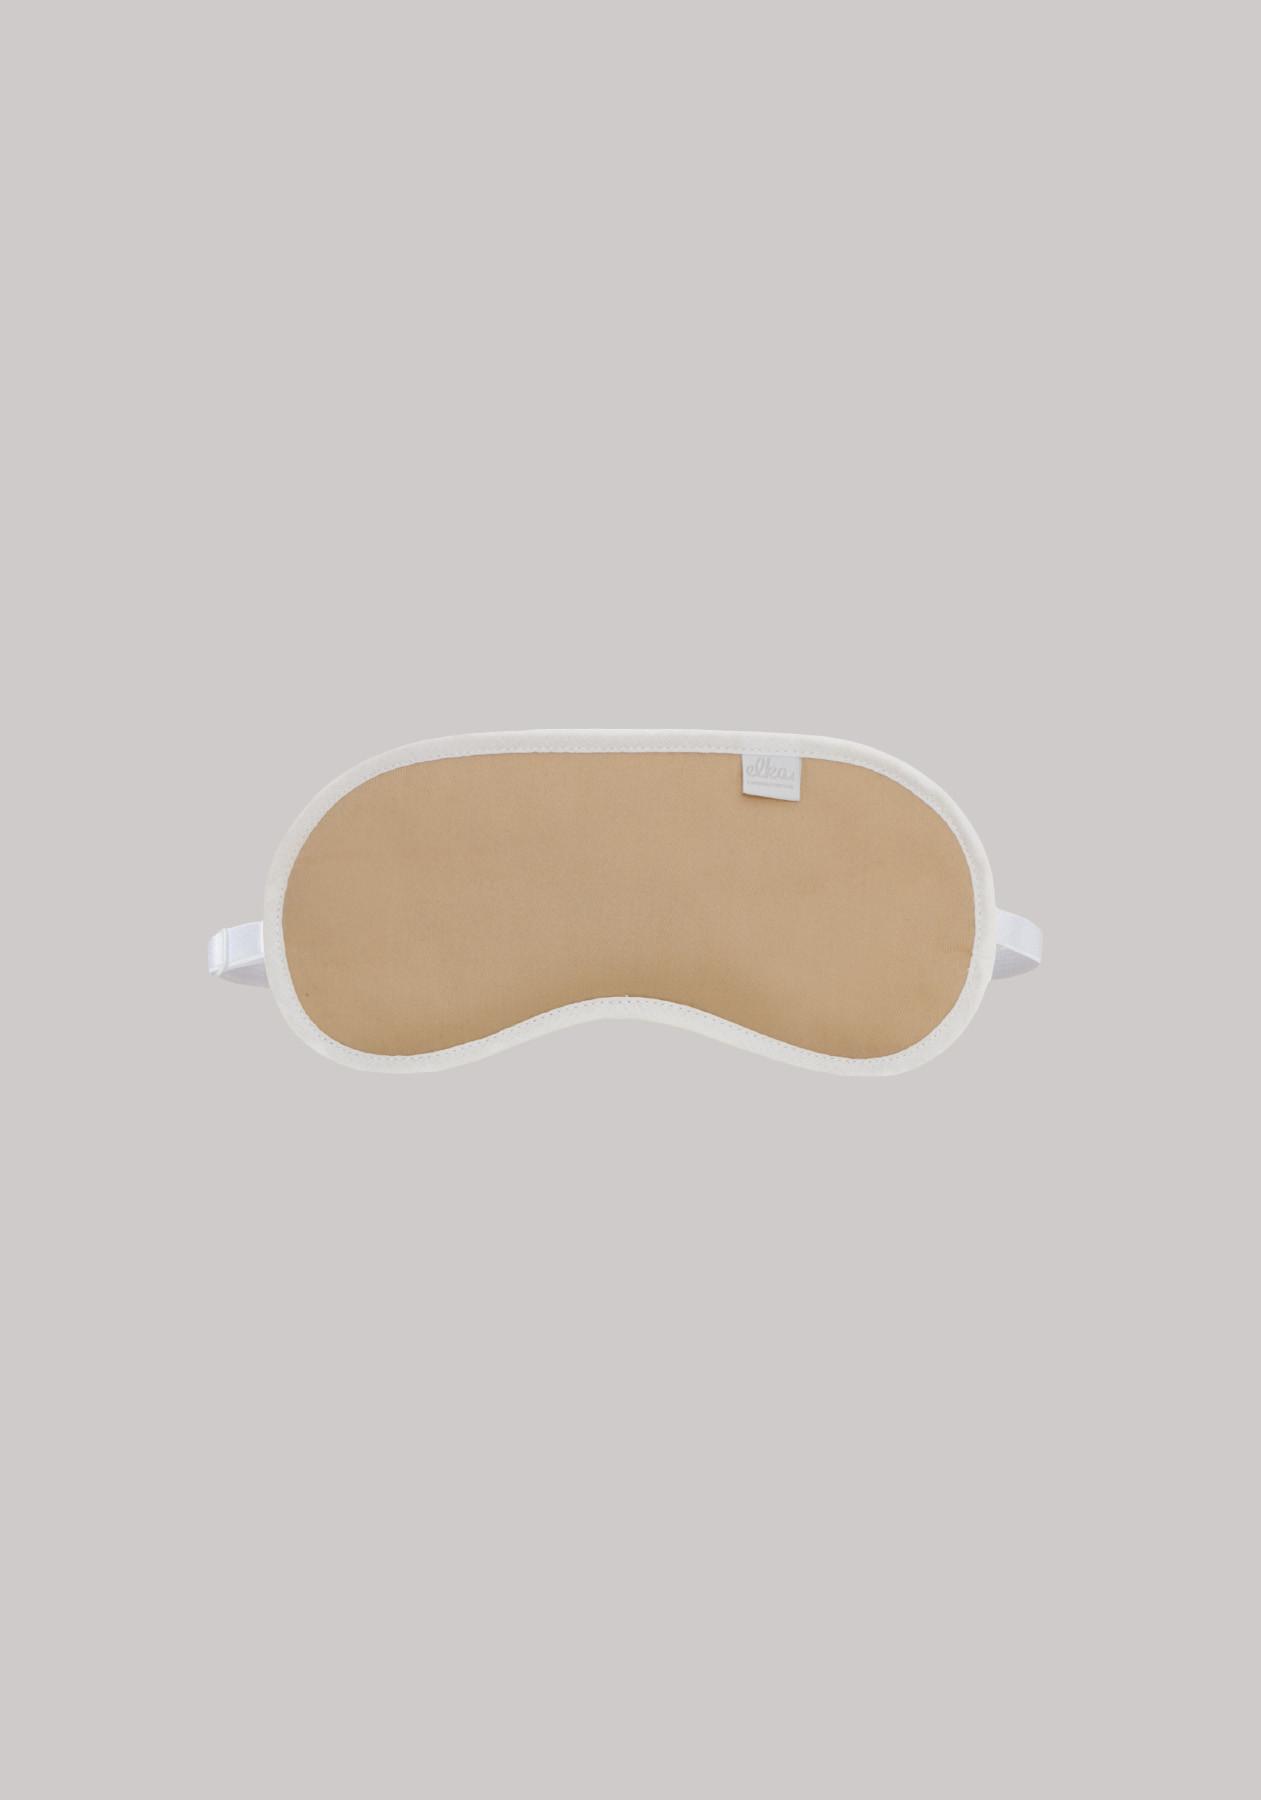 Deco_Home-Sleepmasks-ELKA-Lounge-H00576